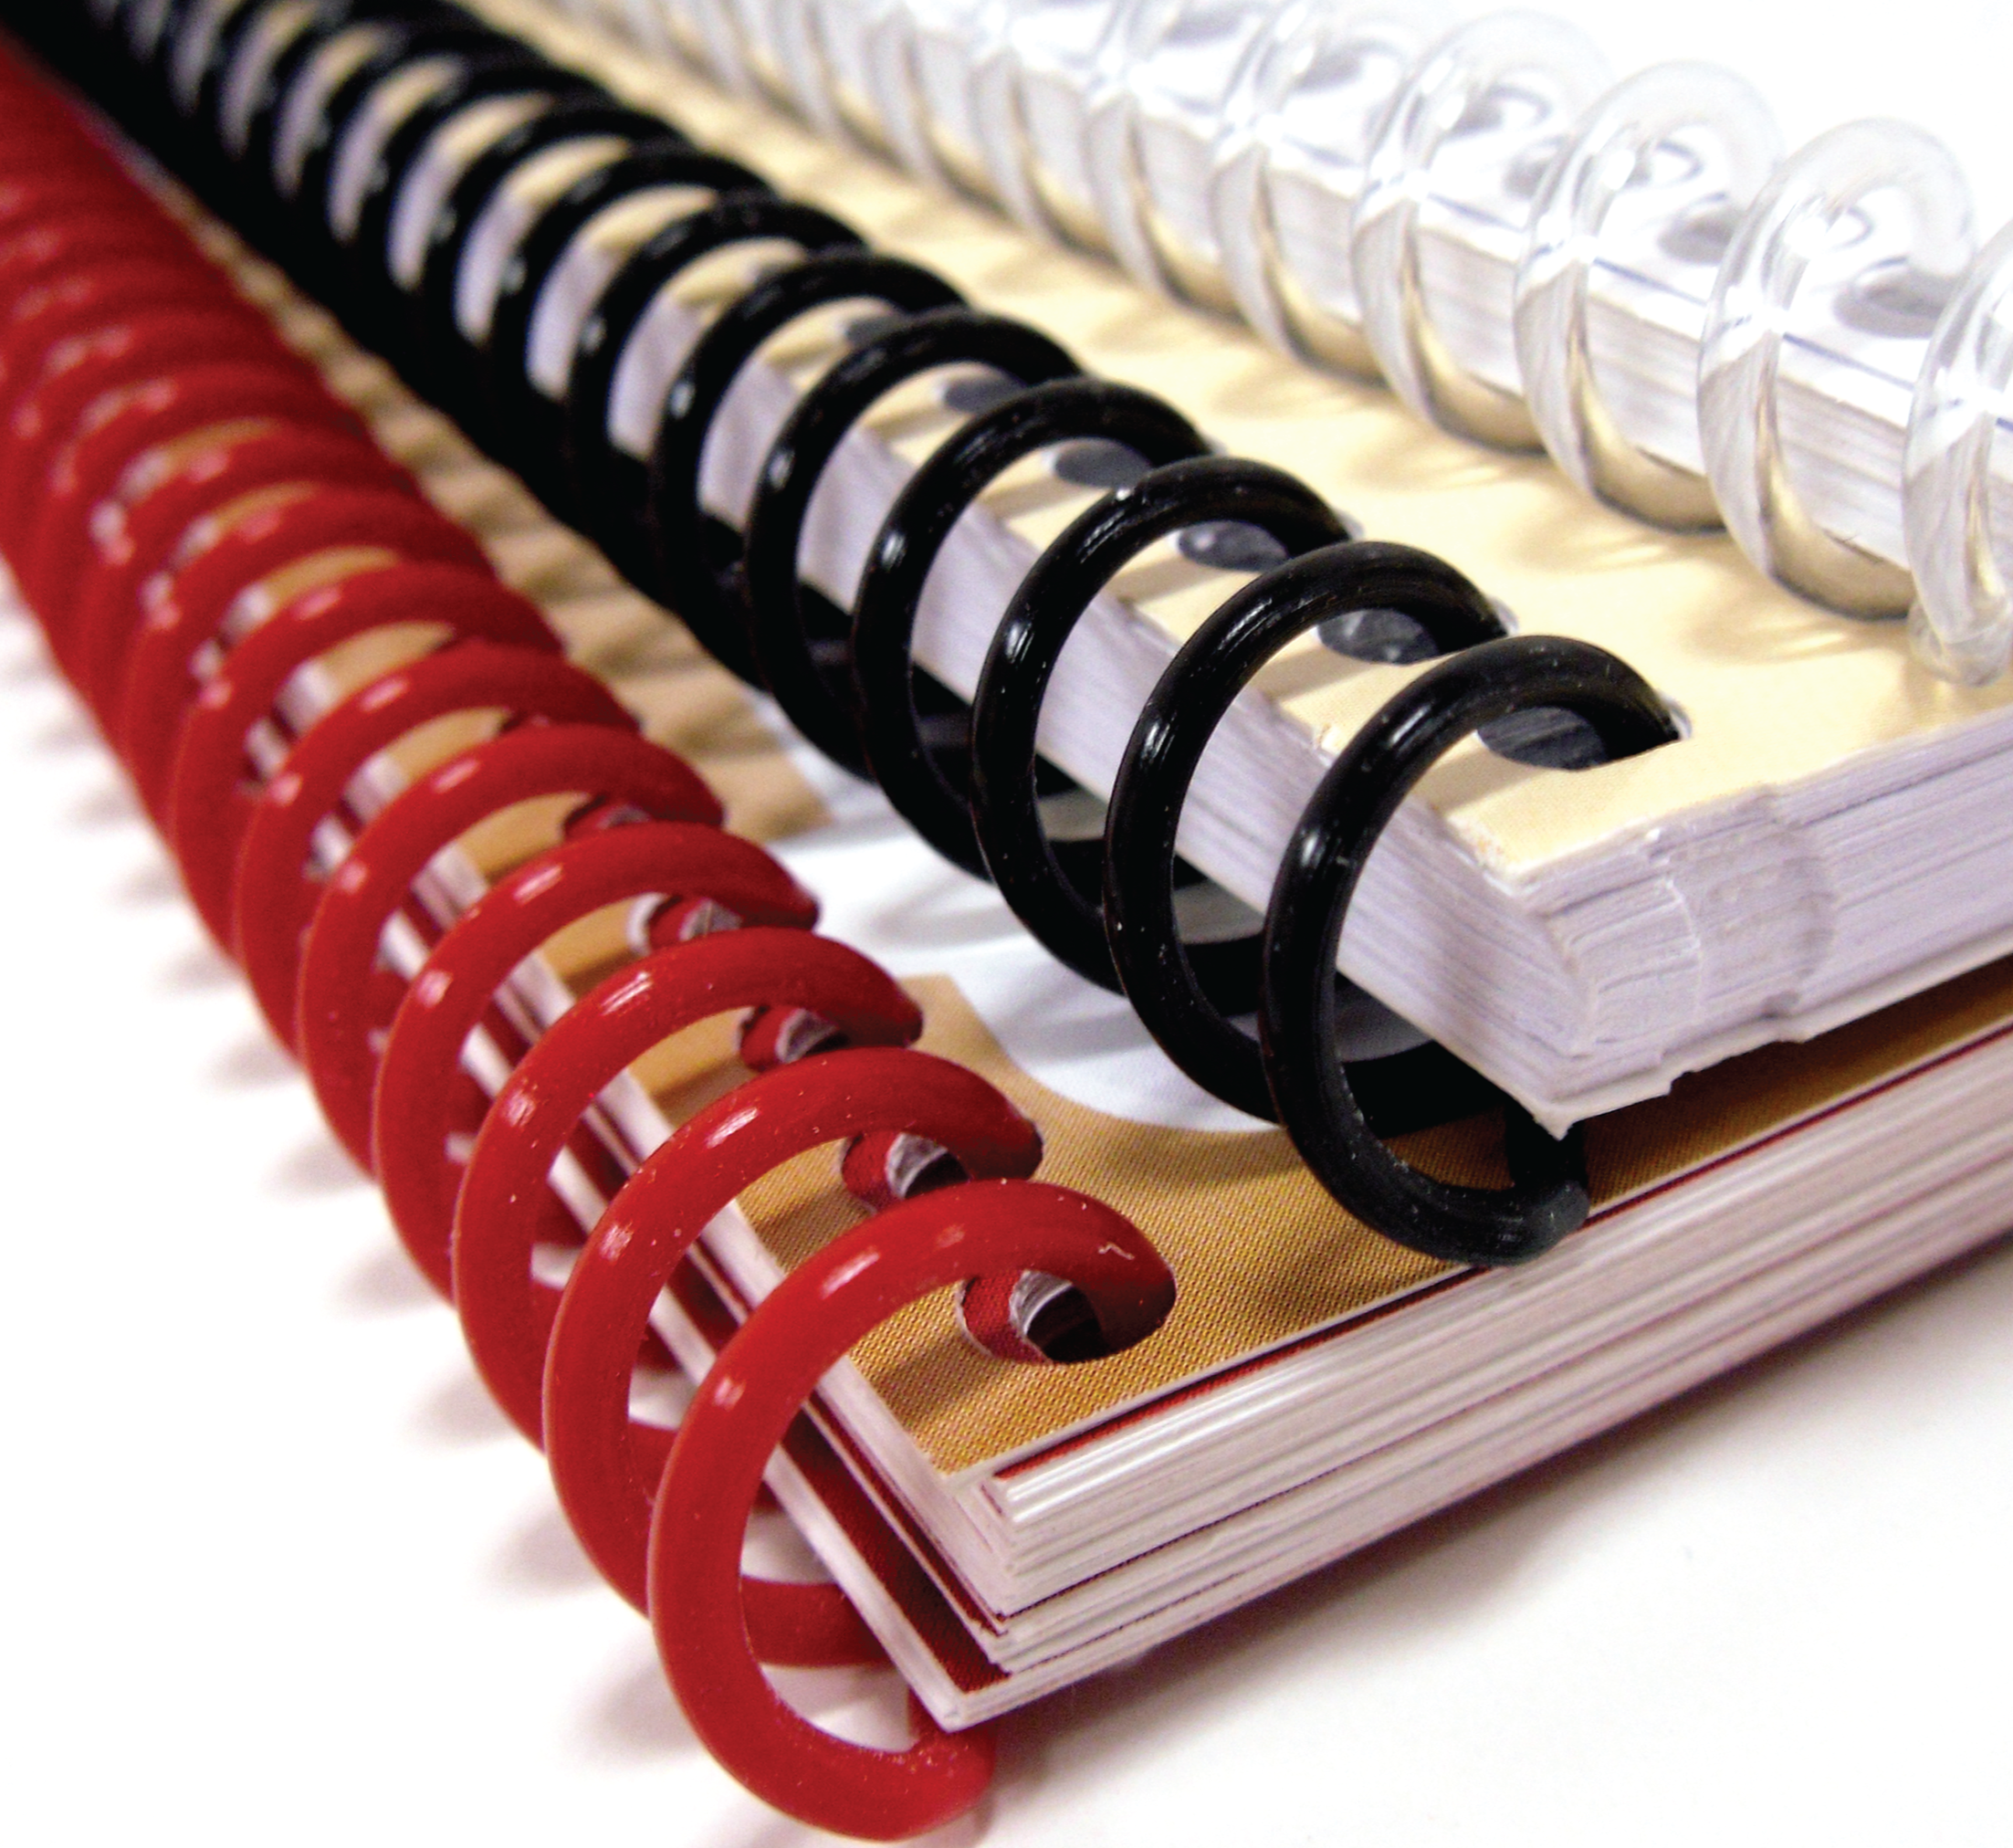 Printing Copying Company